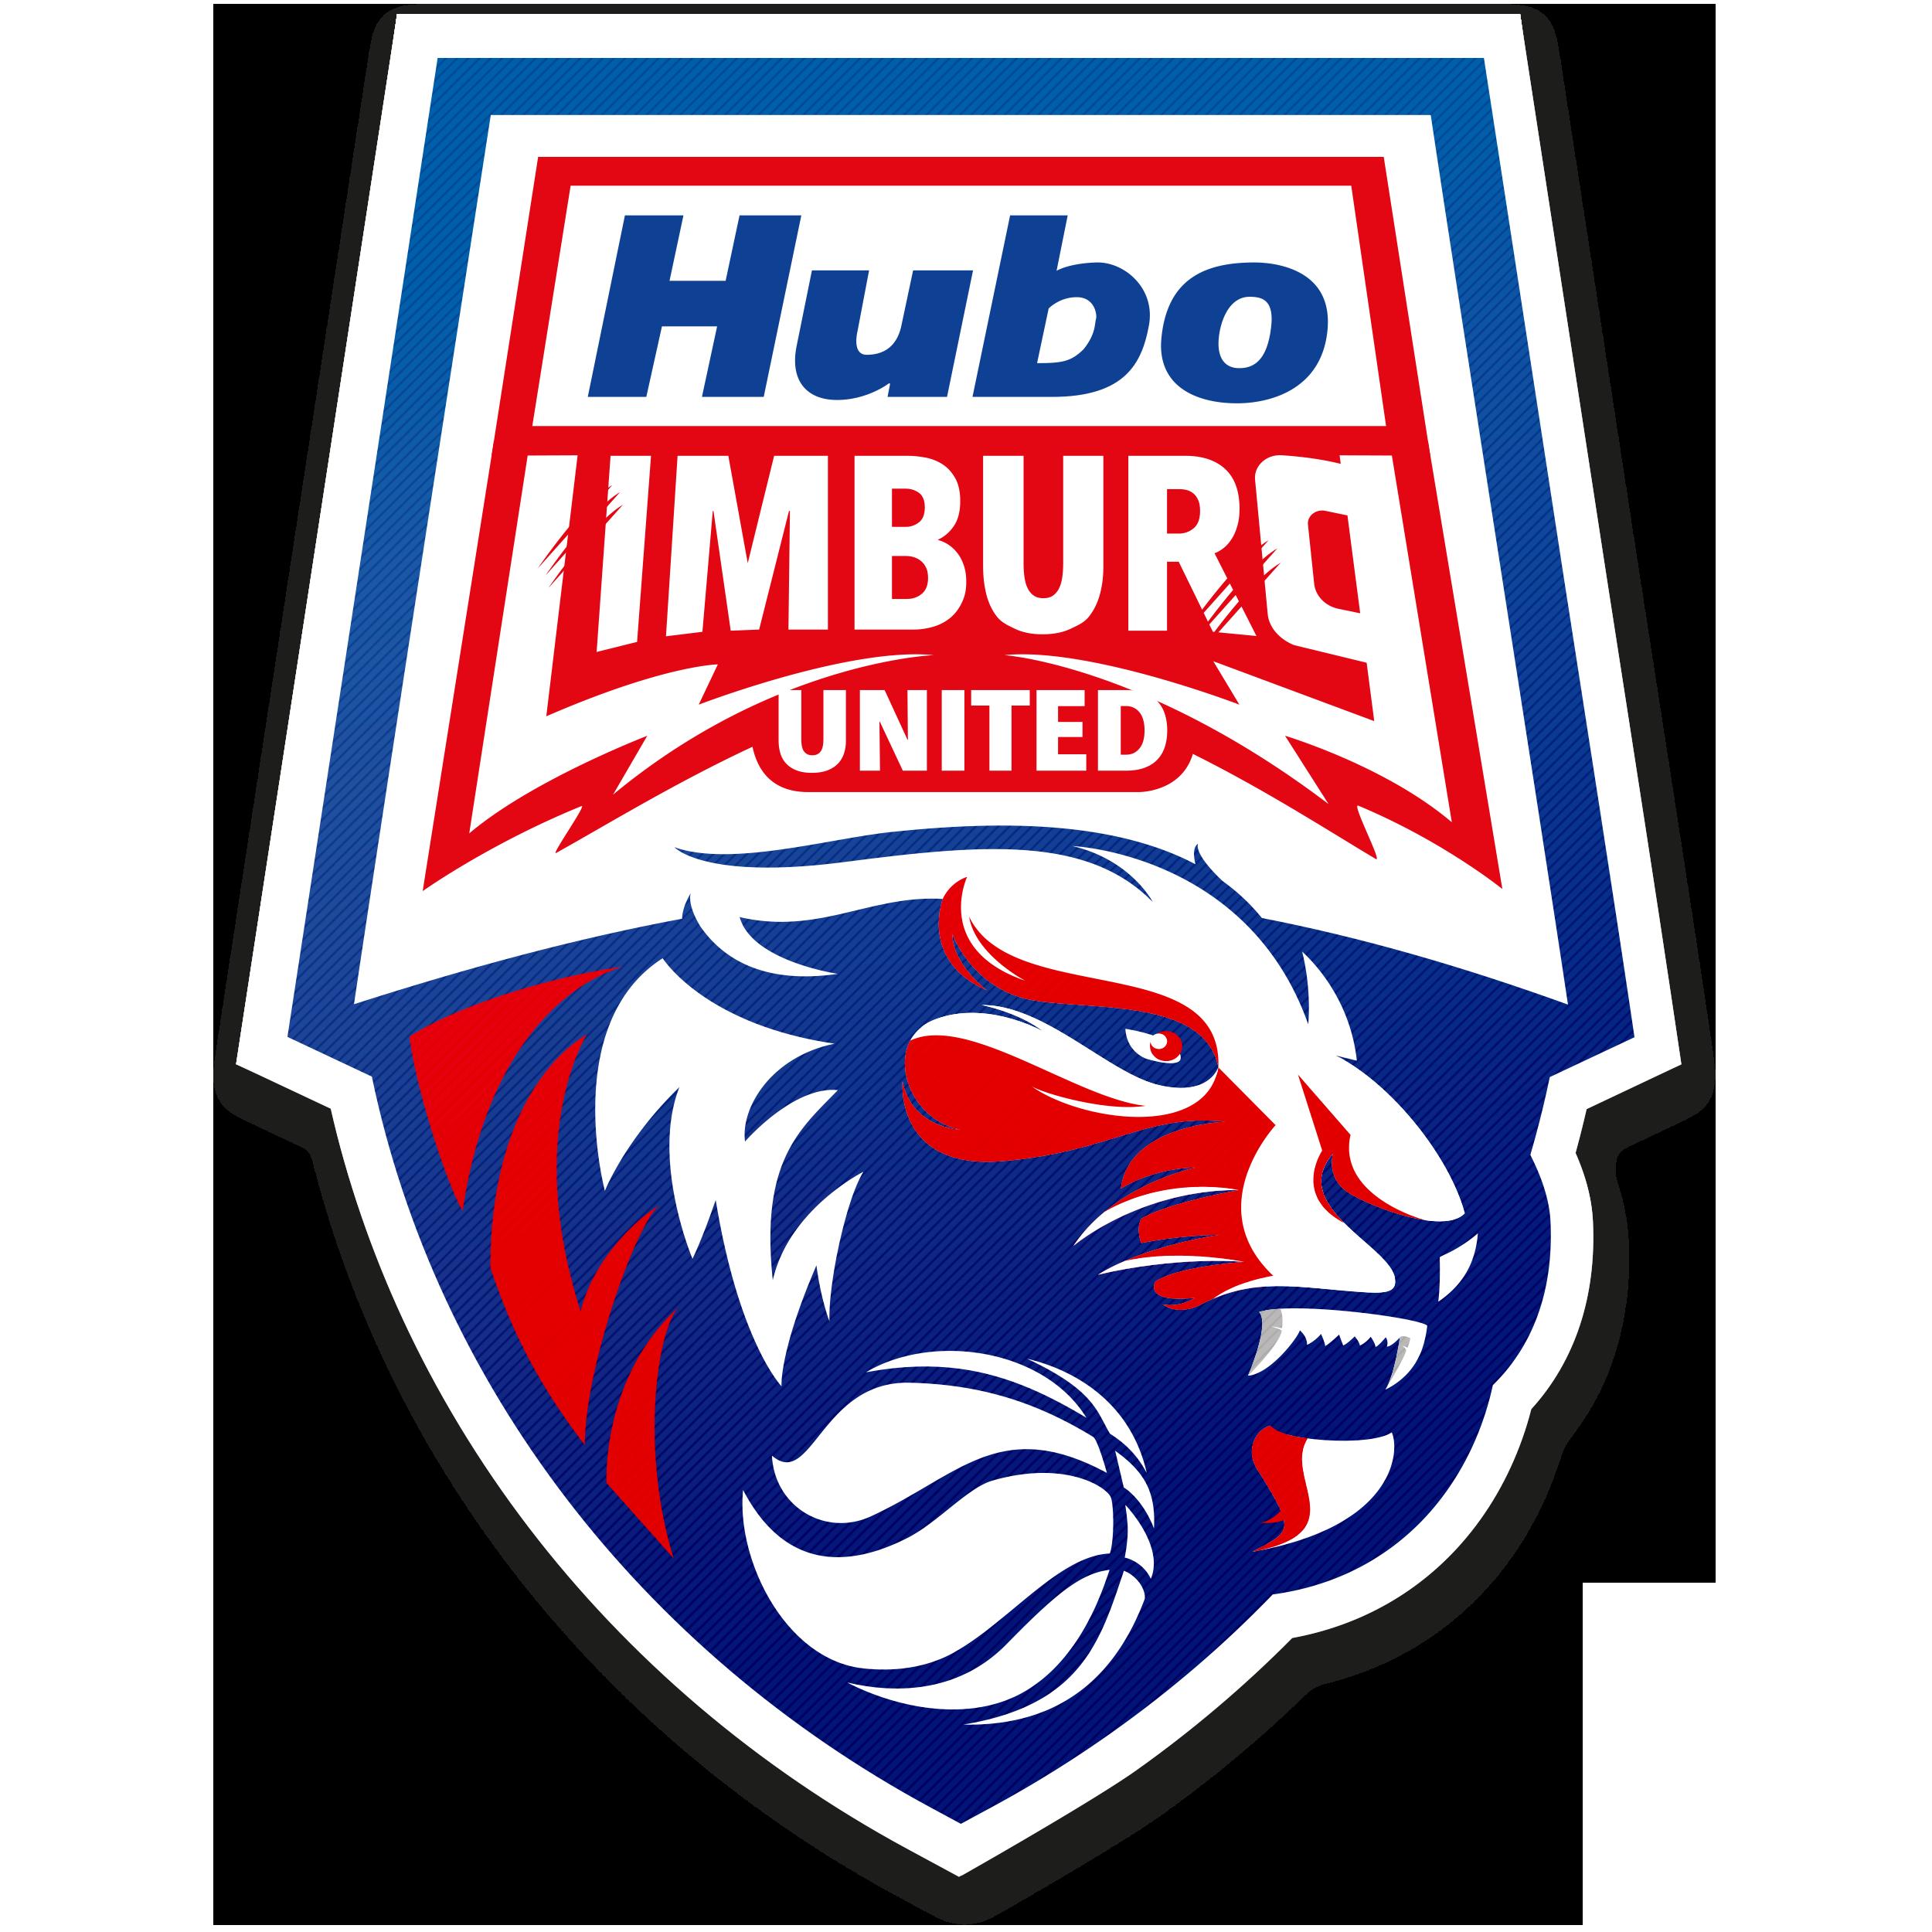 Logo Hubo Limburg United